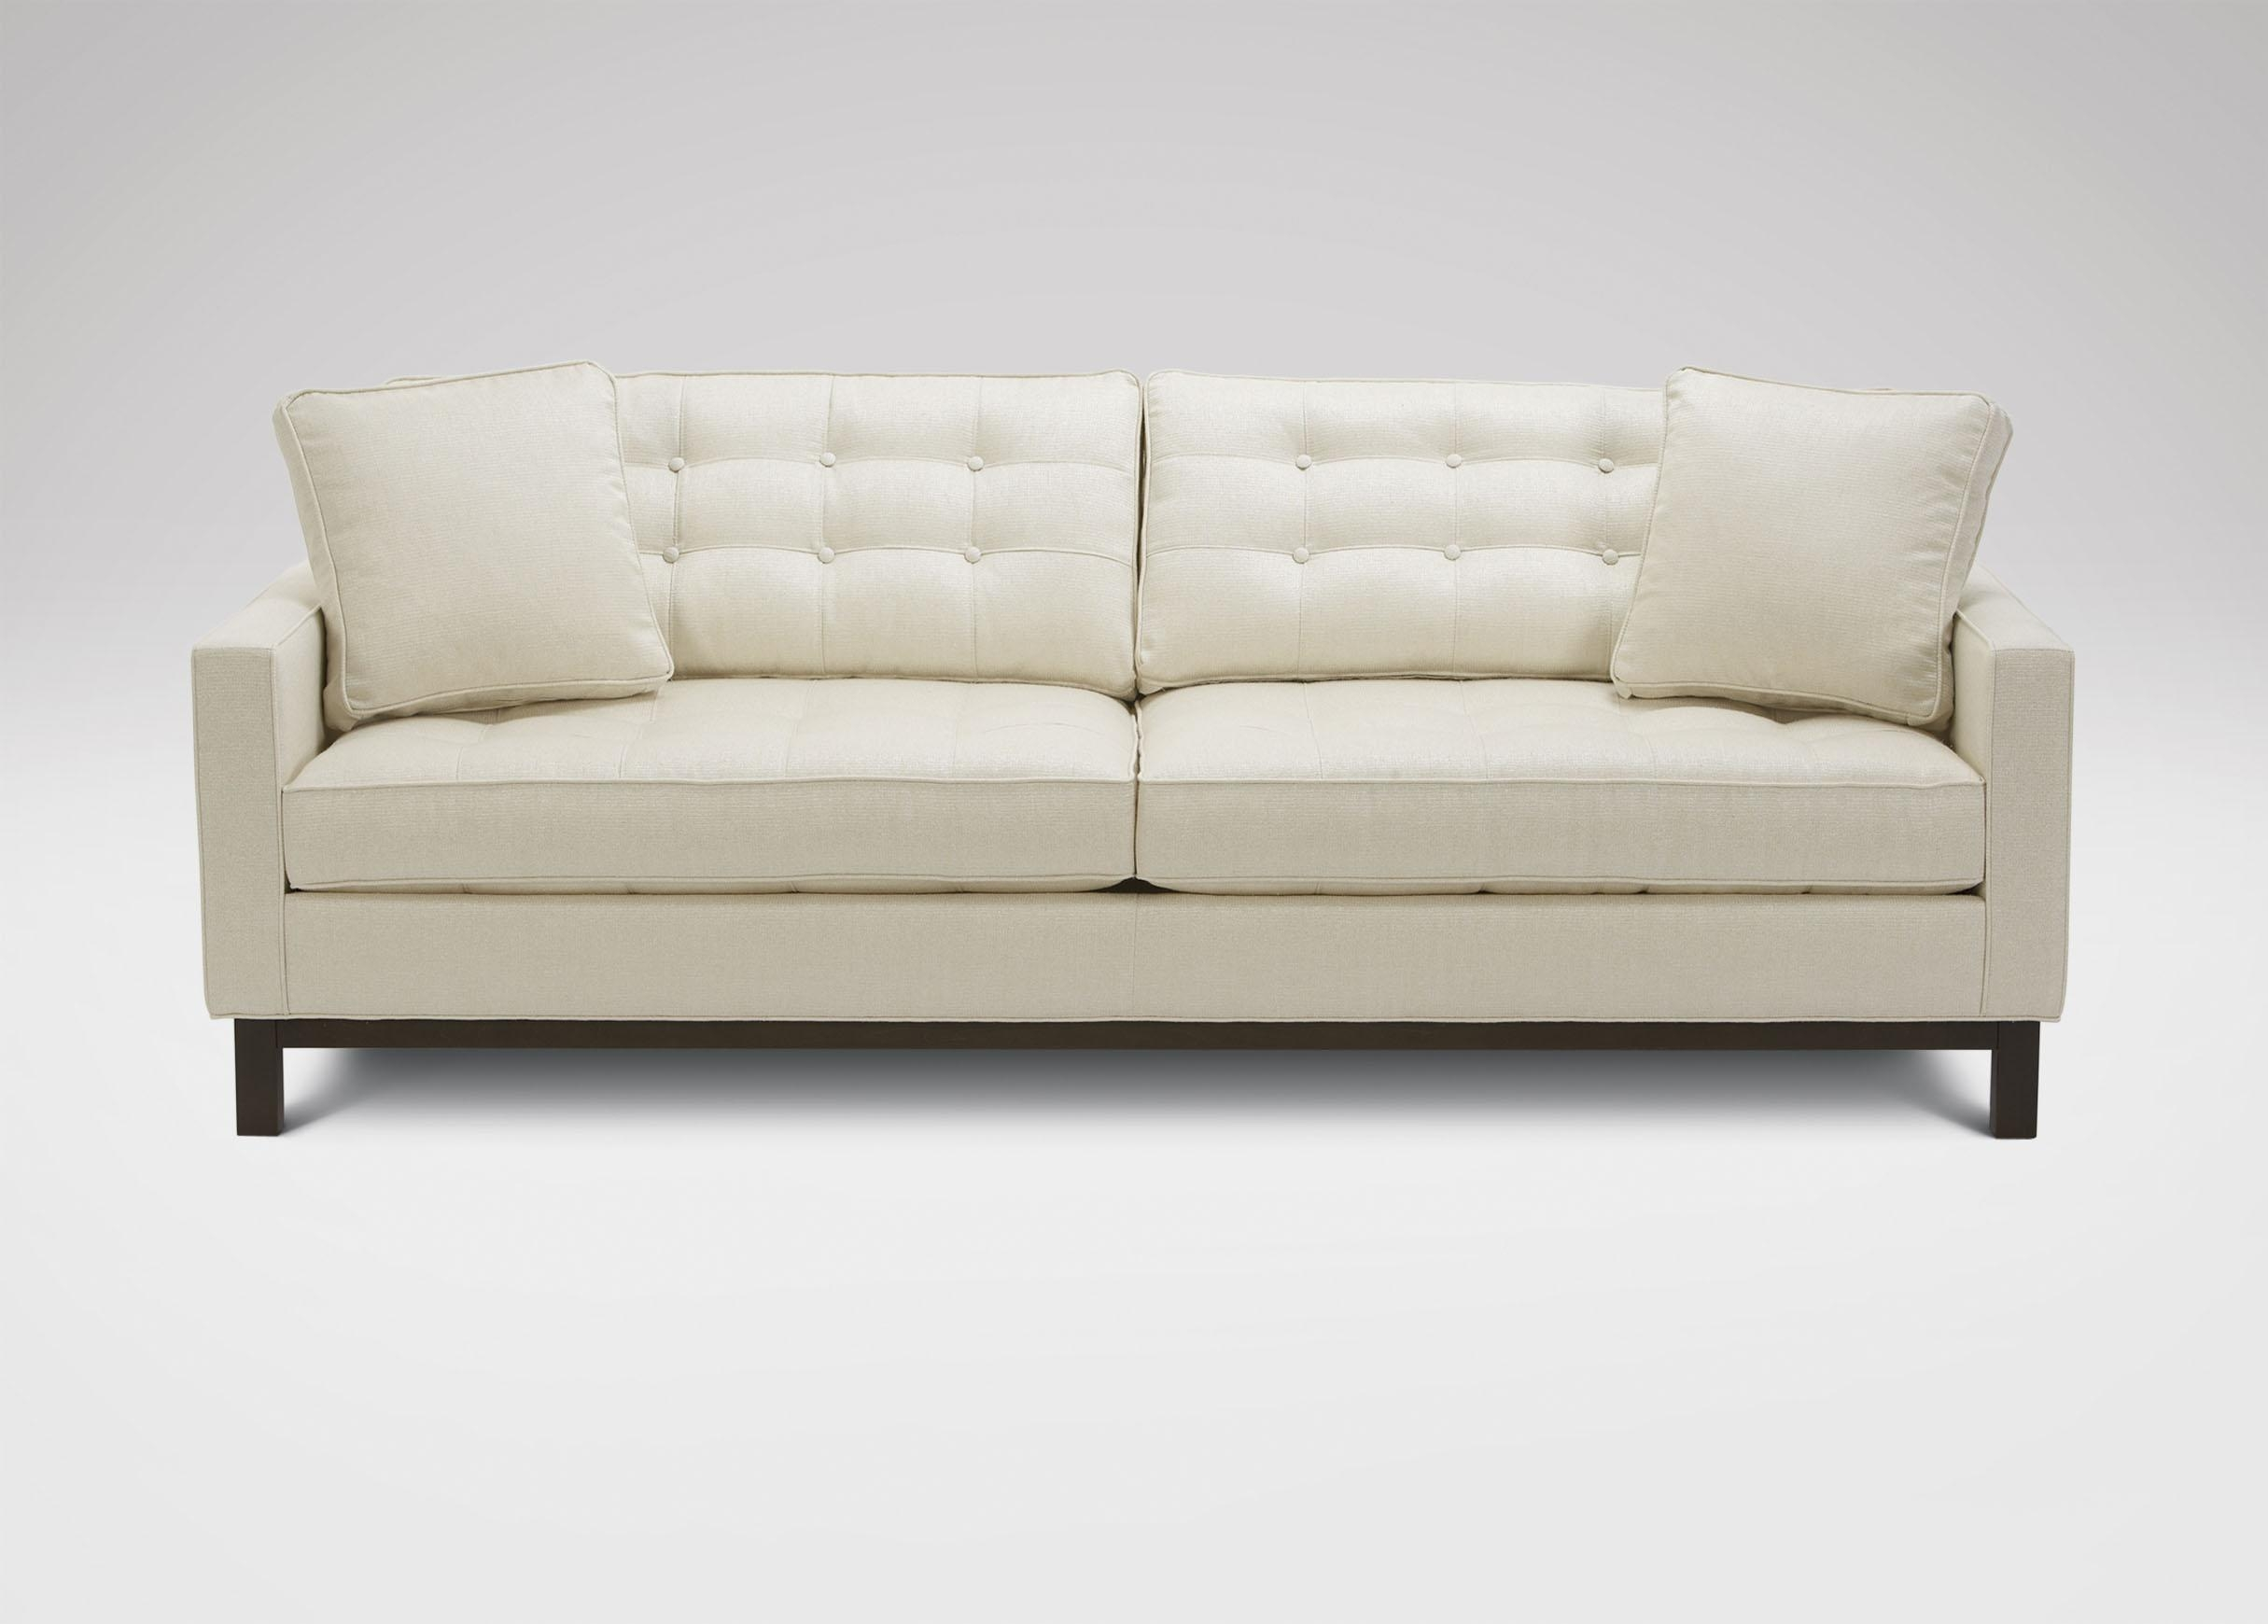 chadwick sofa ethan allen reviews blue plaid set 20 top sofas ideas